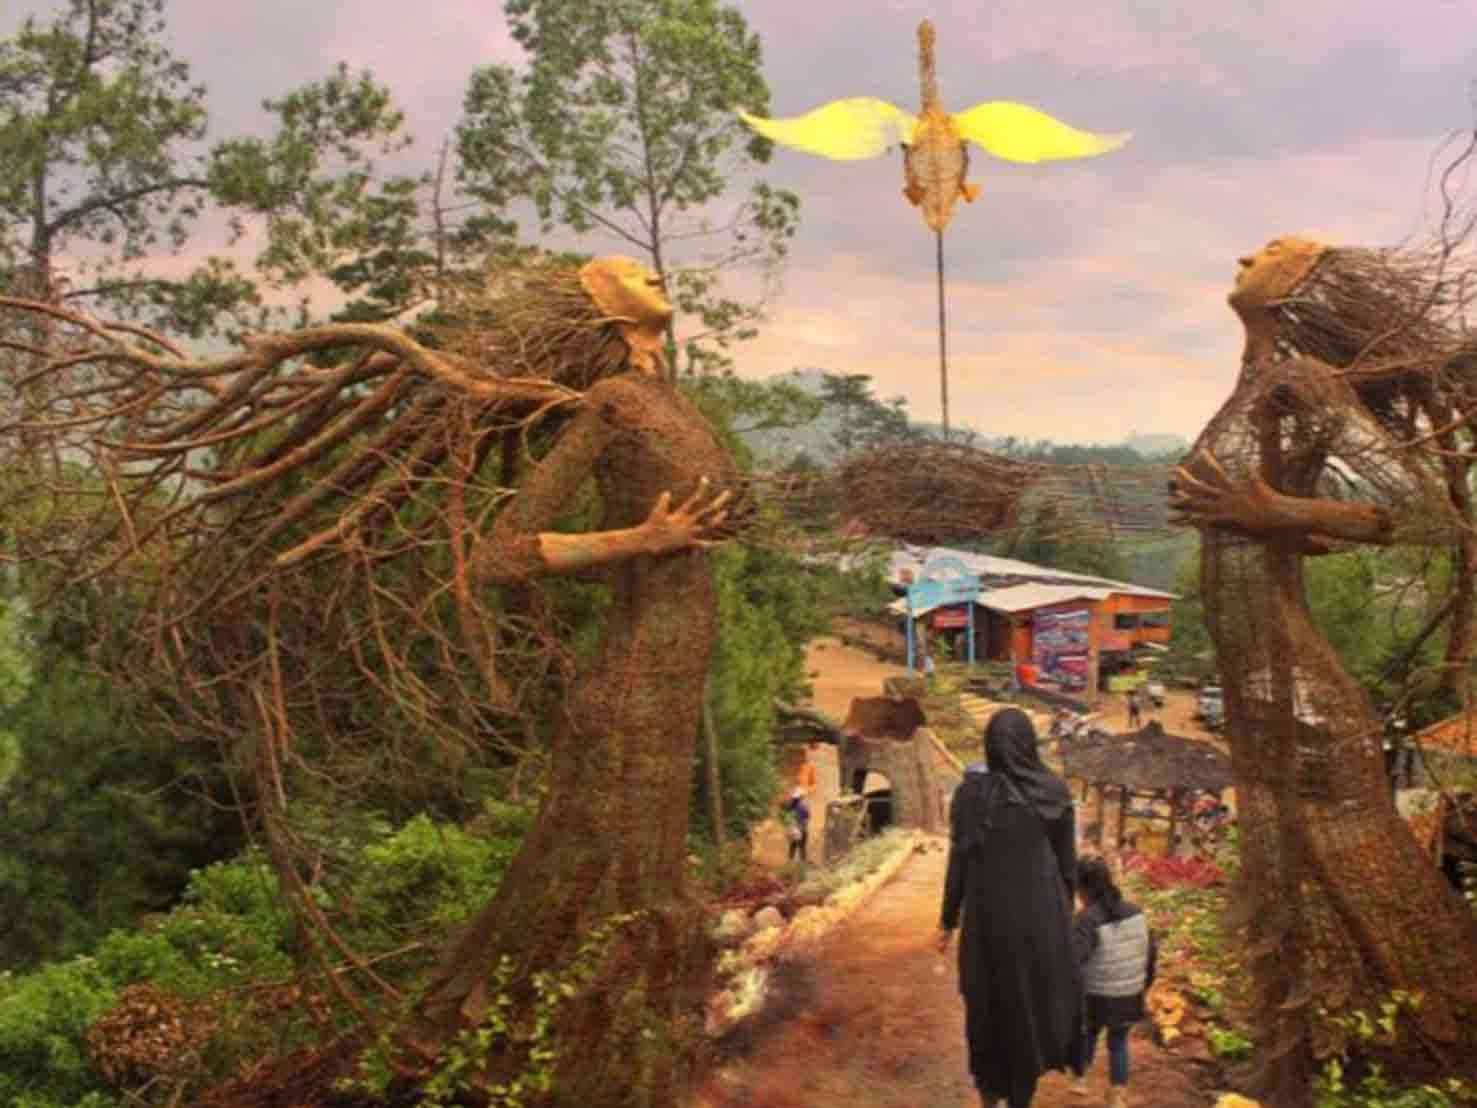 Taman Langit Wahana Wisata Kota Batu 1 2017 2018 2019